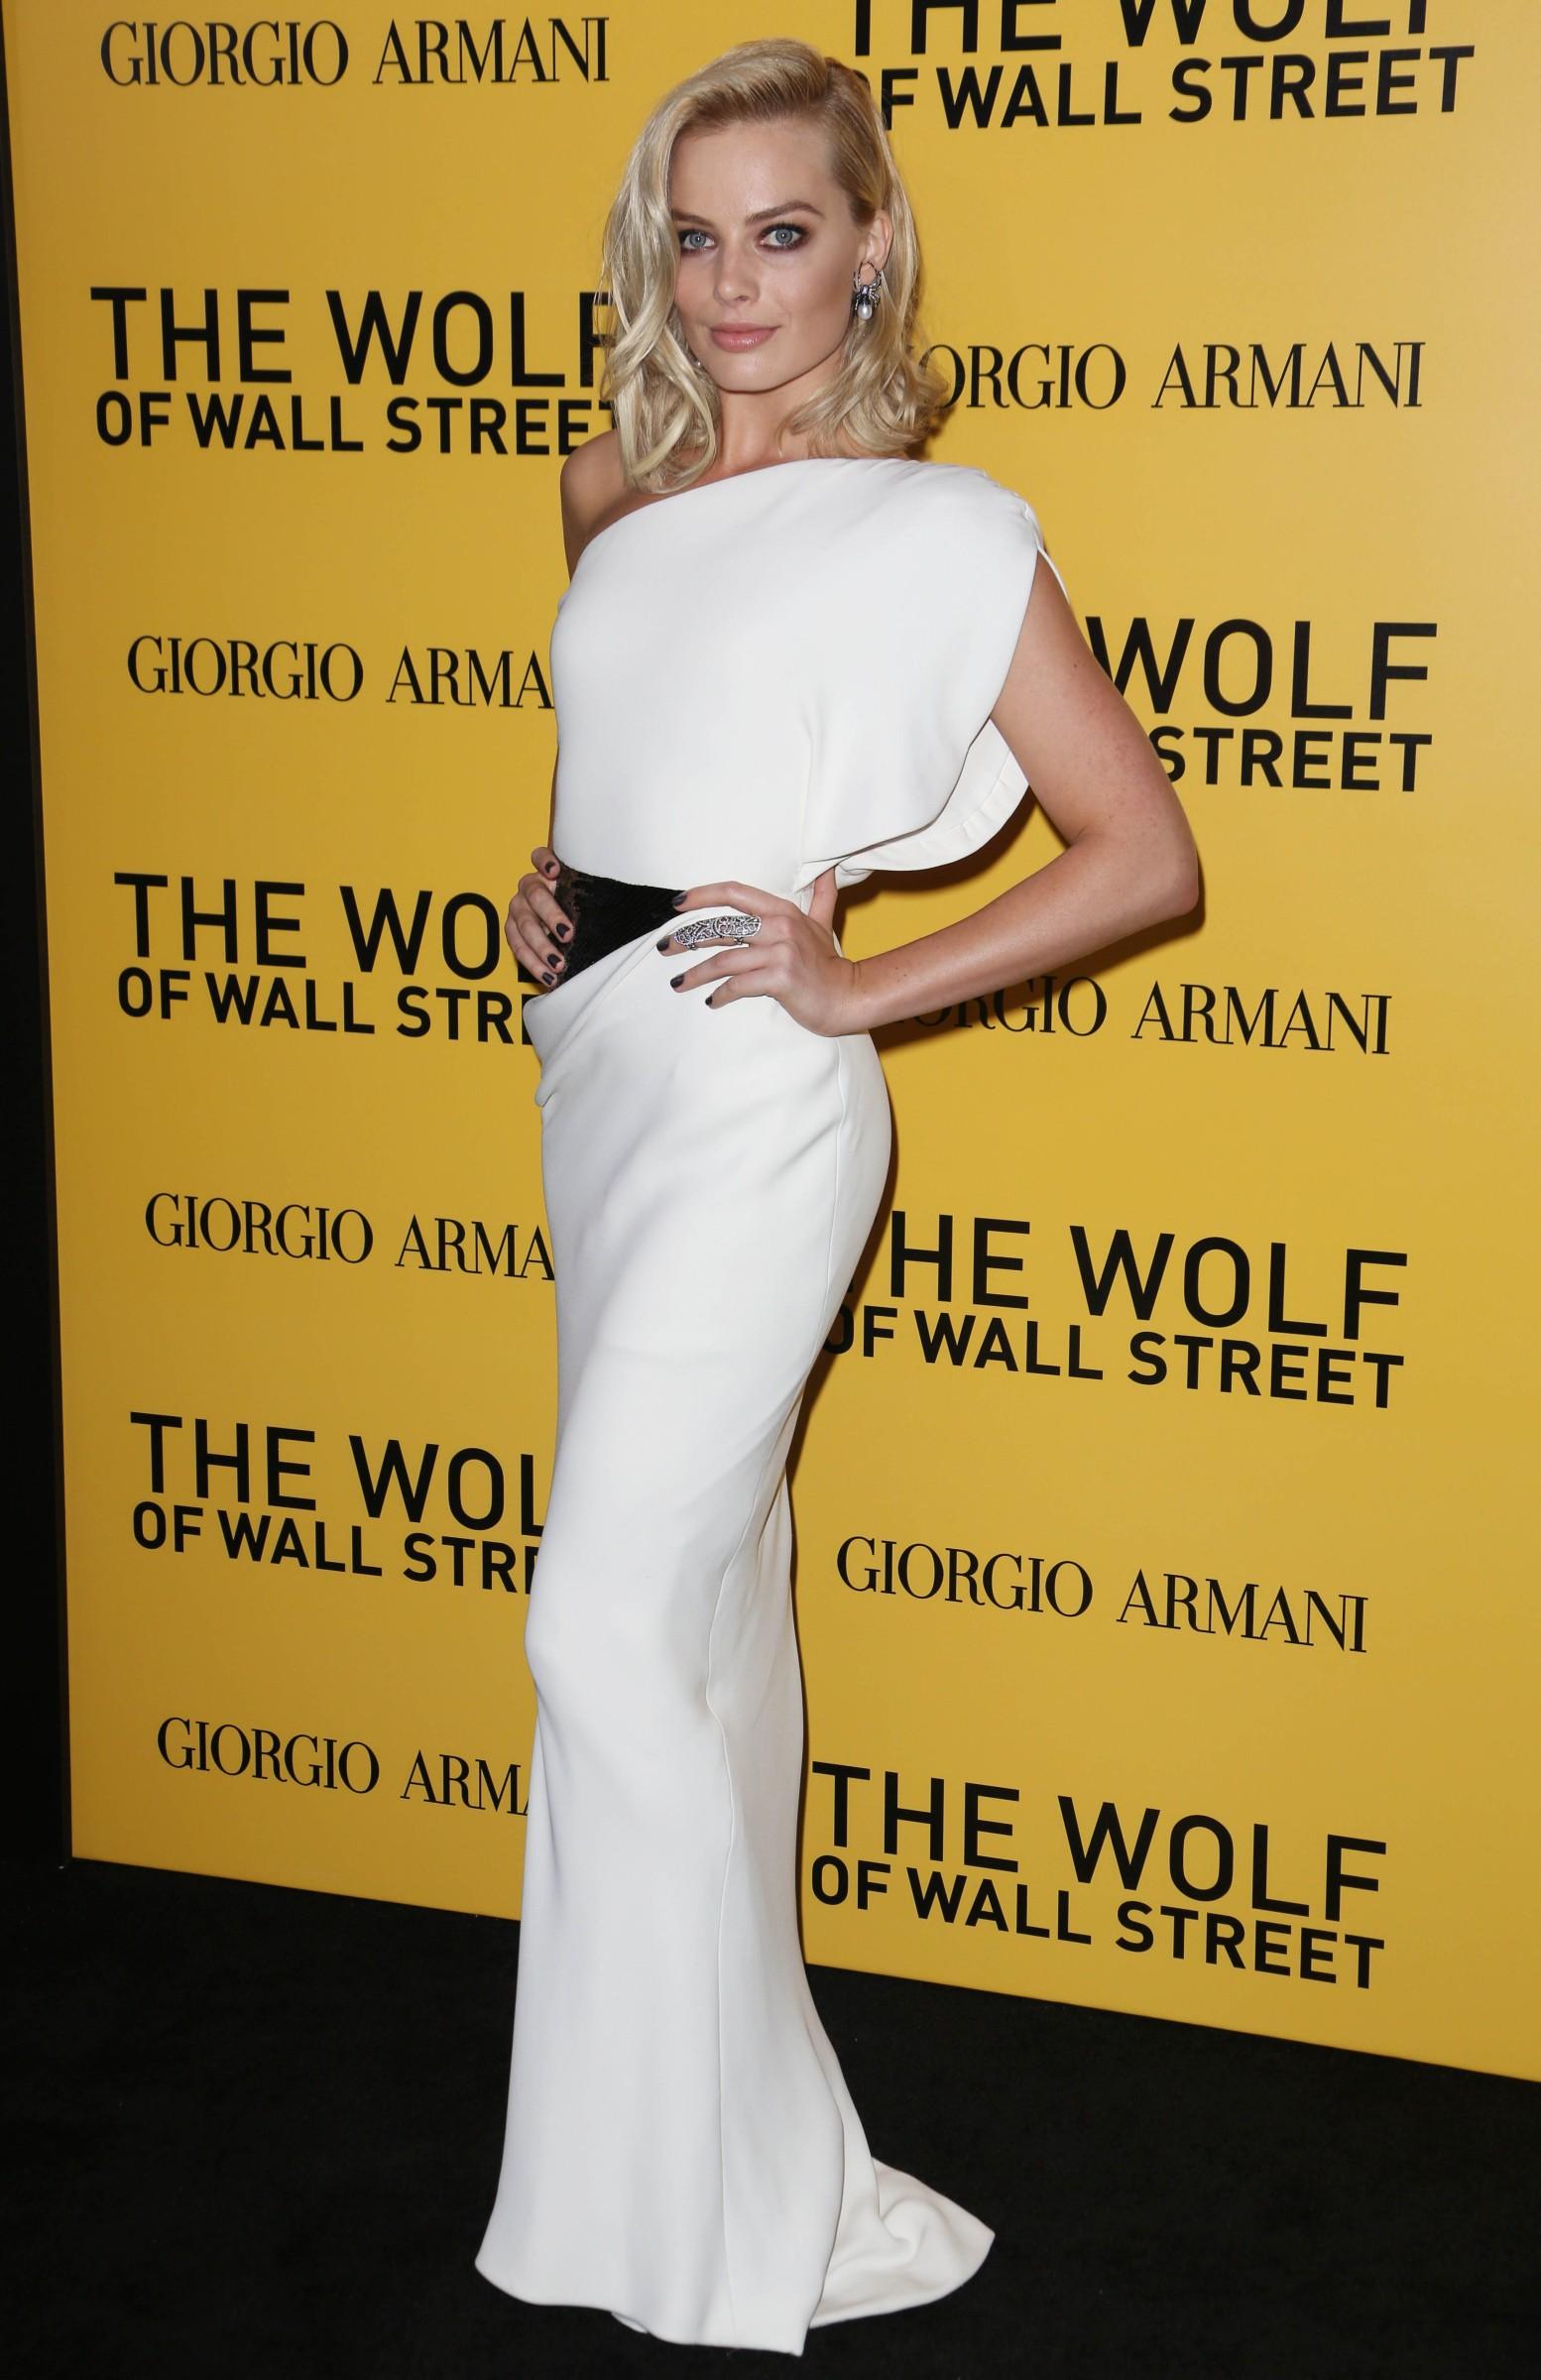 'The Wolf of Wall Street' film premiere, New York, America - 17 Dec 2013